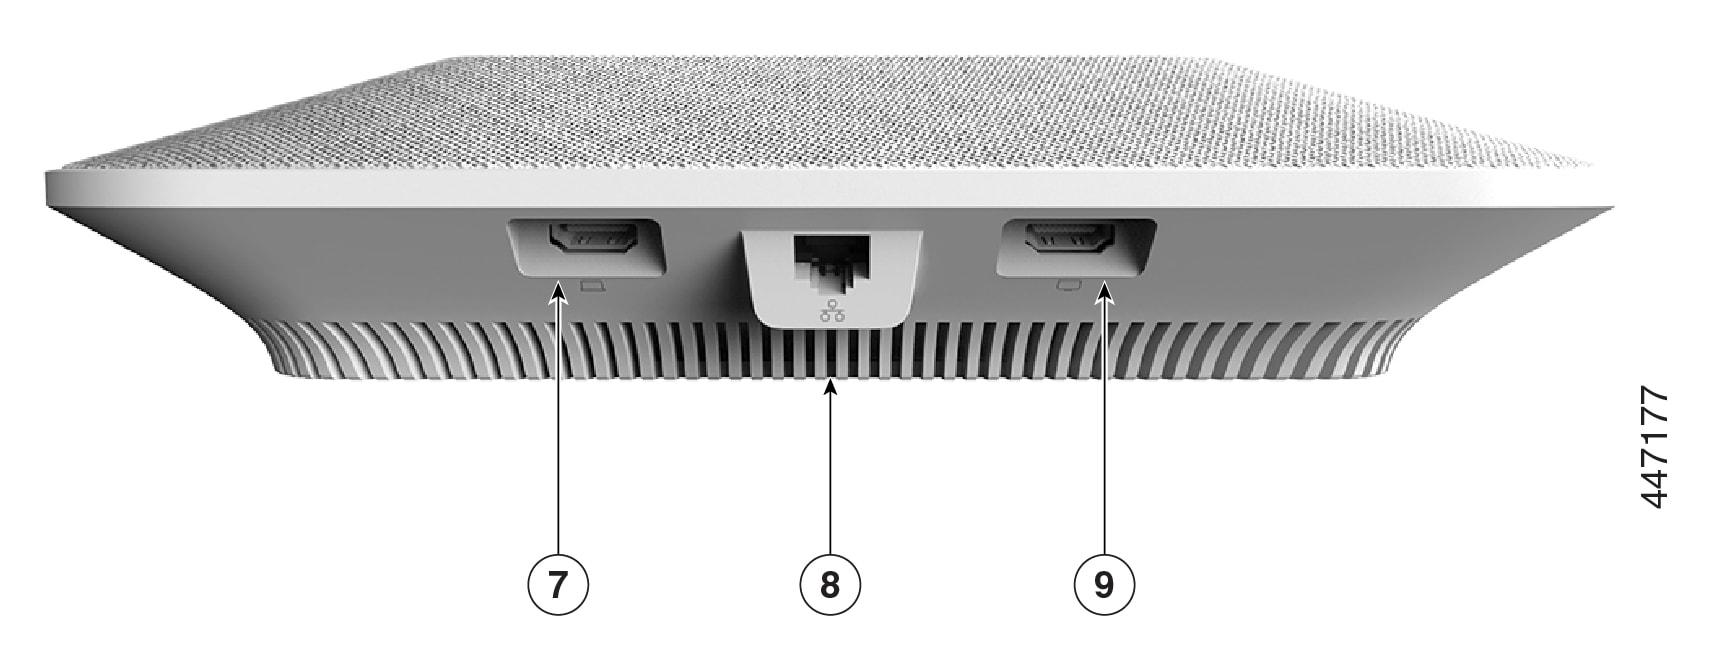 Bildtexter: Nummer 6 pekar på datorns HDMI-port. Nummer 7 pekar på LAN-porten. Nummer 8 pekar på skärmens HDMI-port.